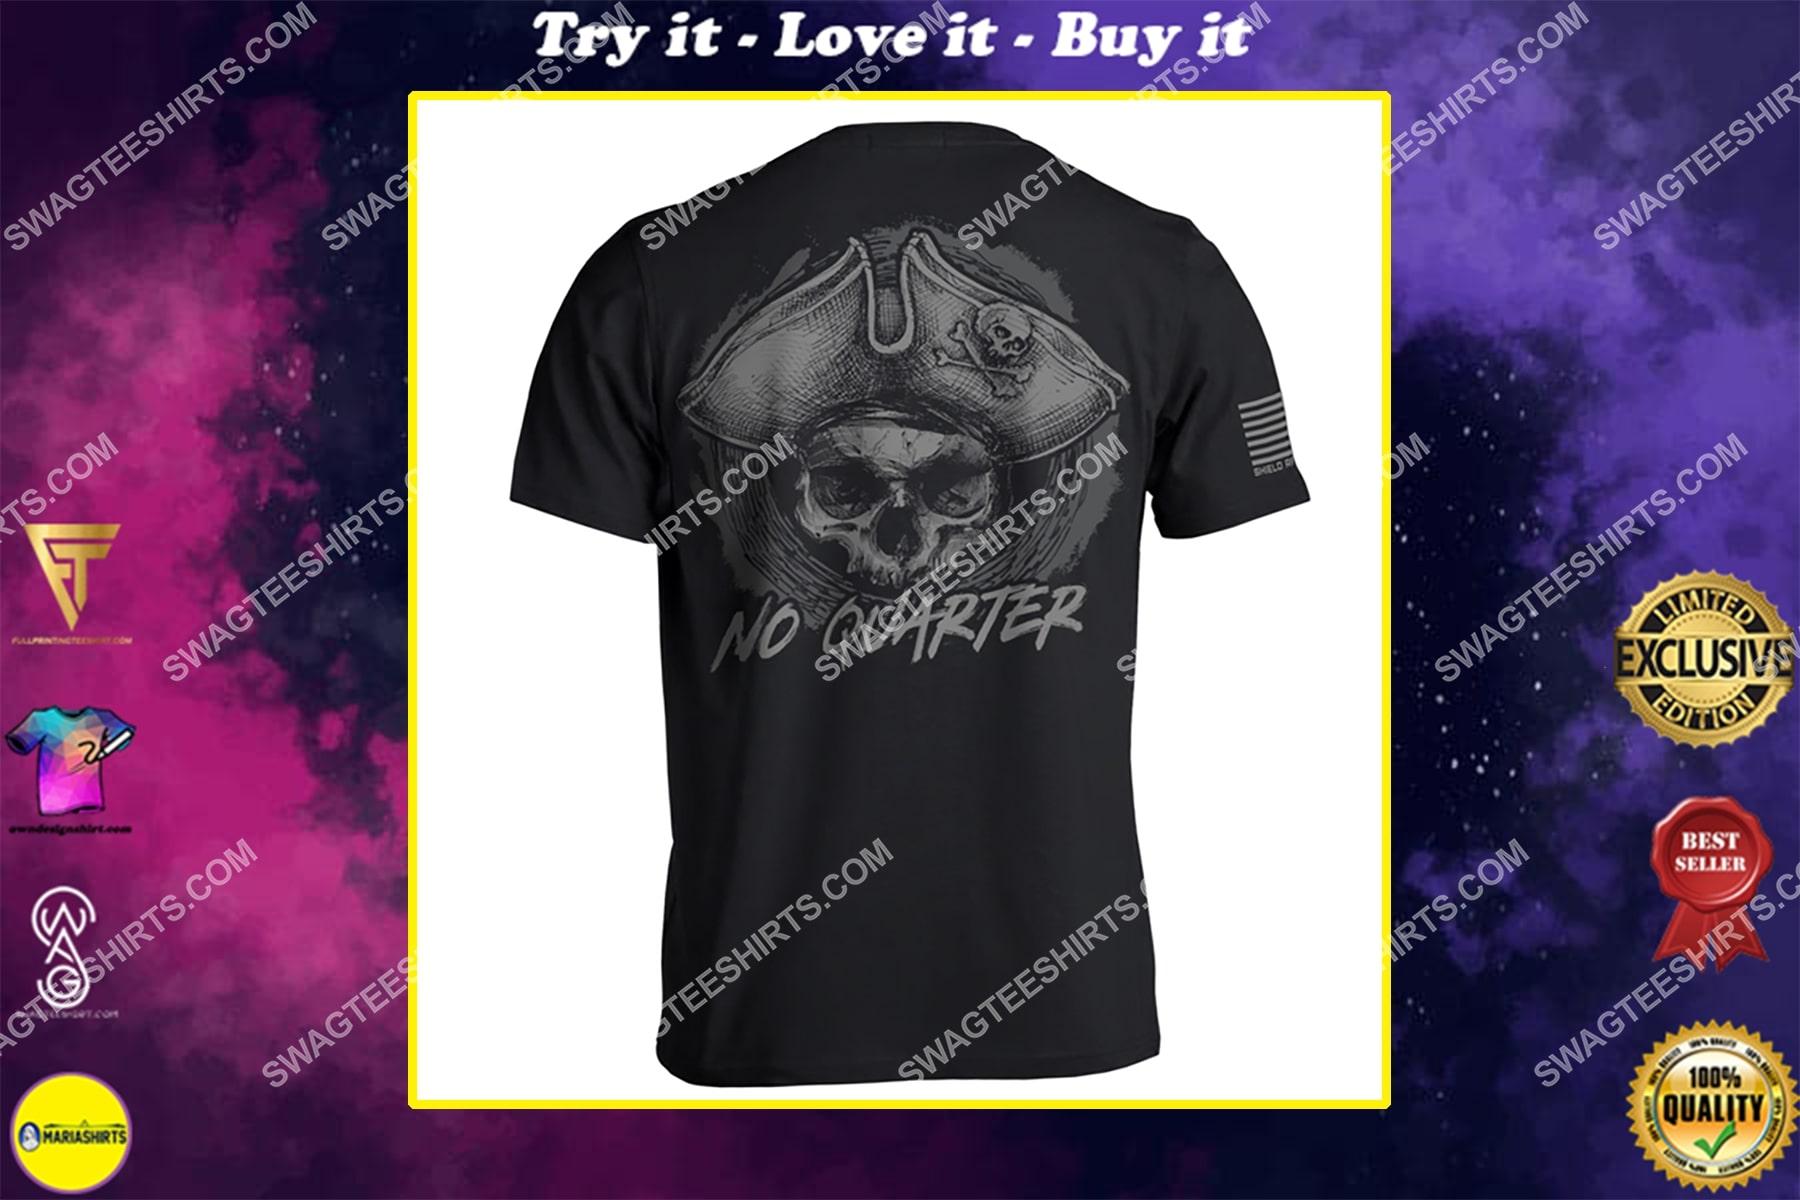 no quarter skull vintage full print shirt